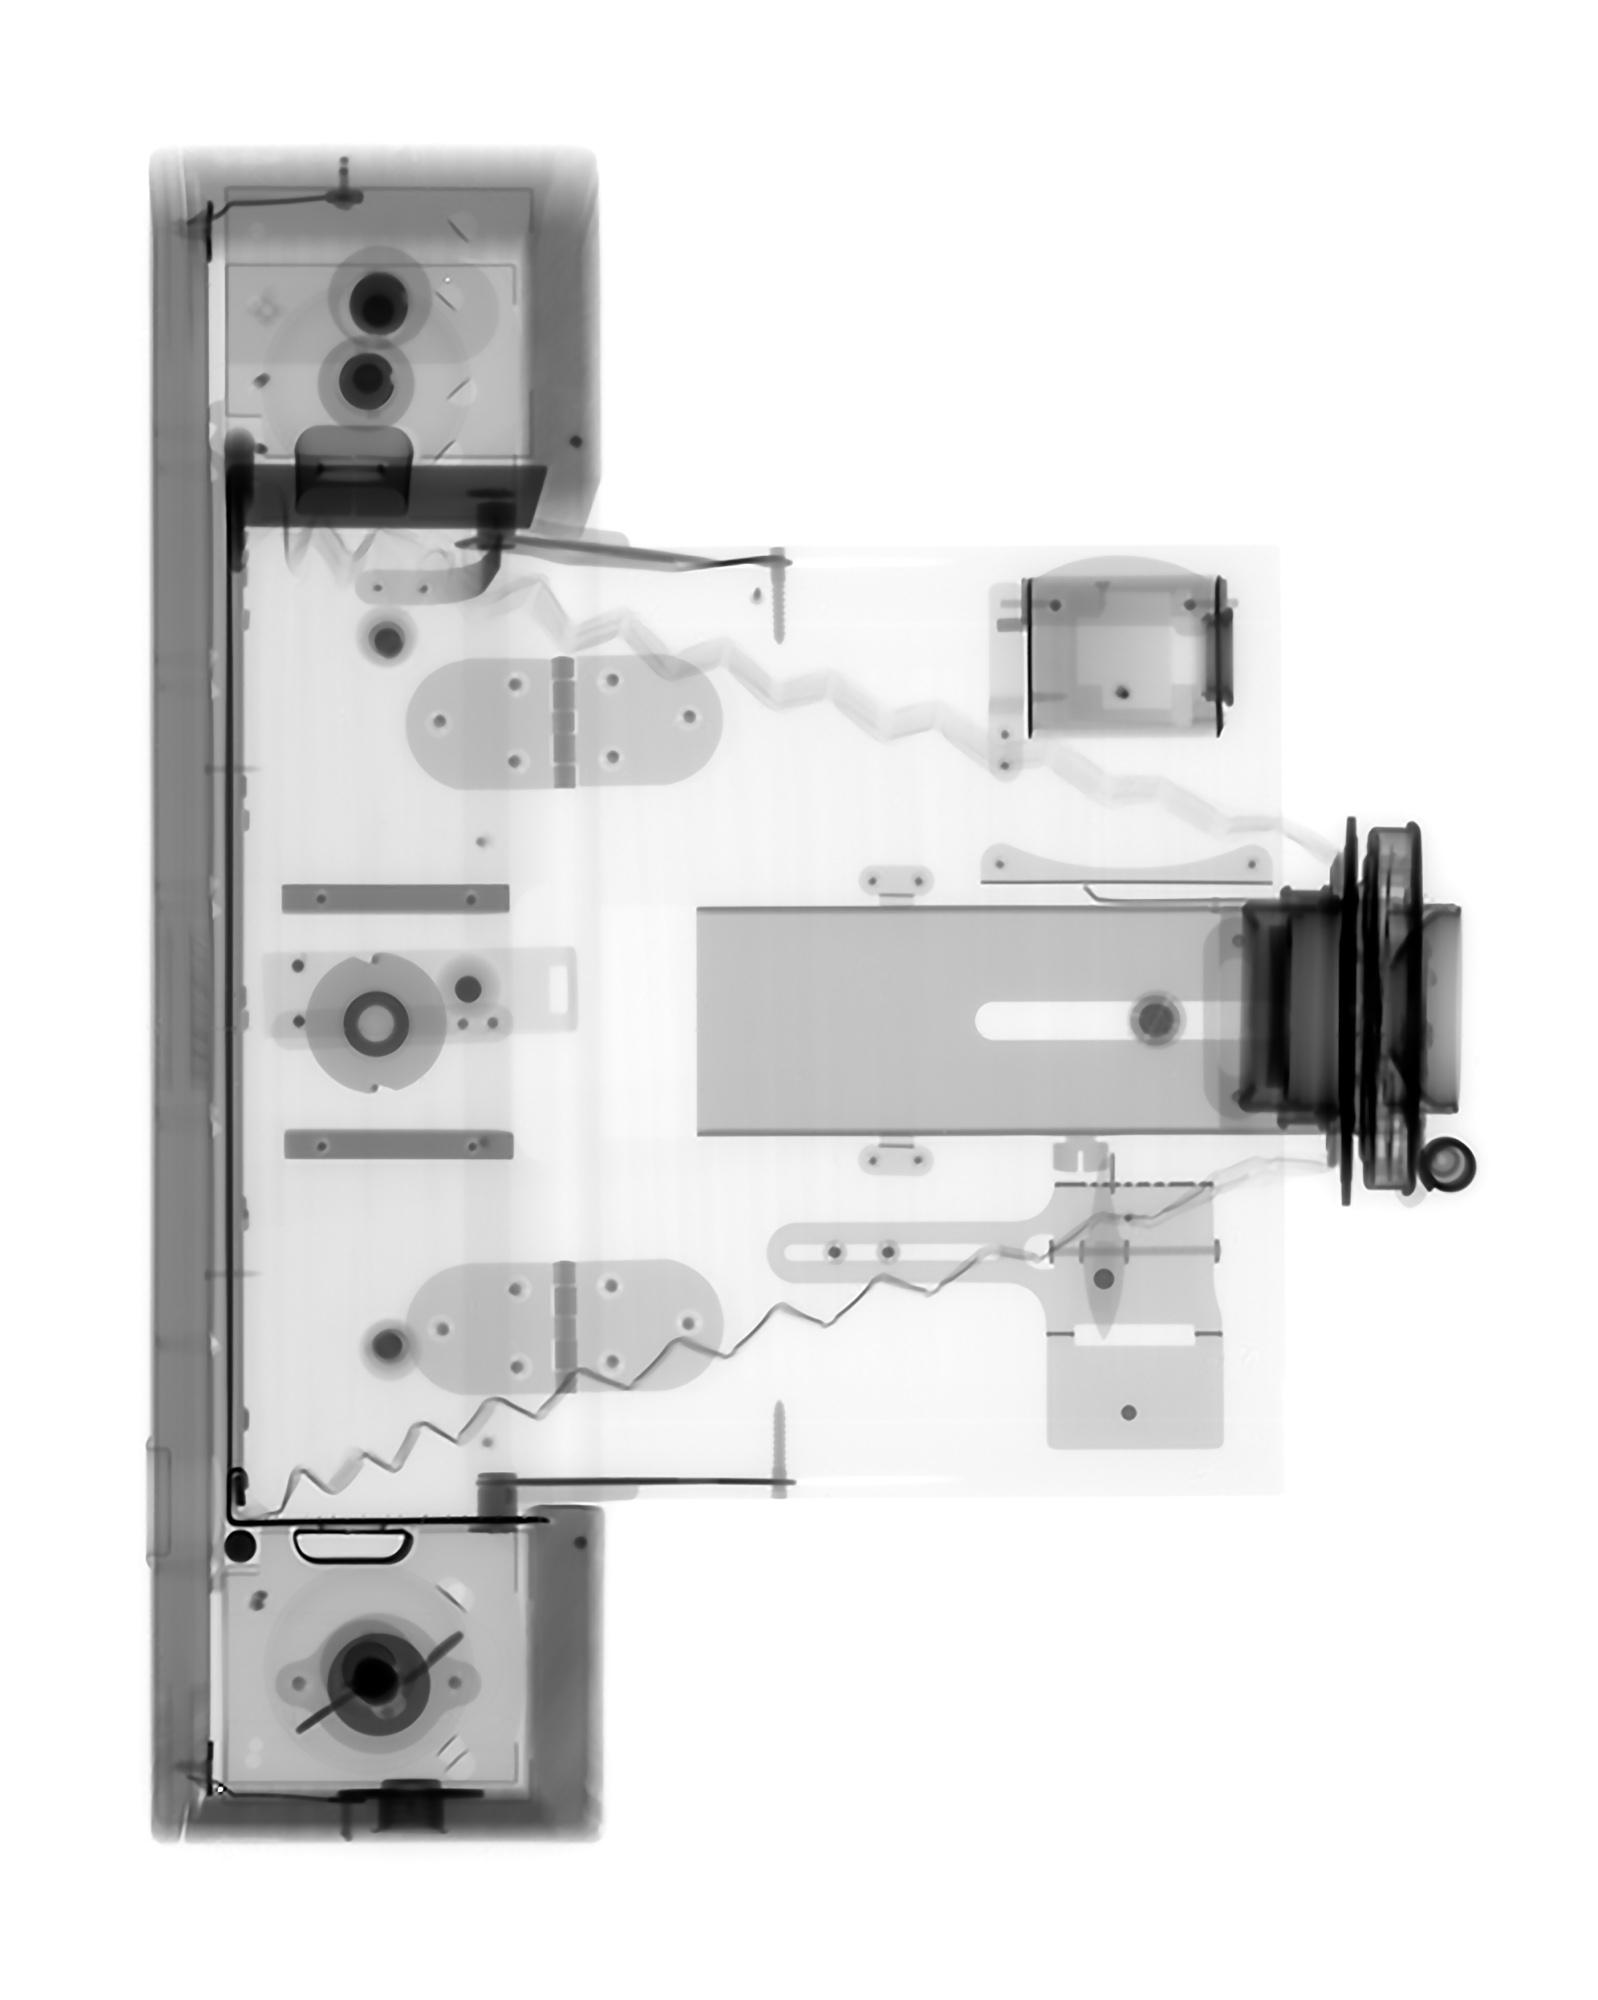 Kodak No 3-A Folding Brownie Camera